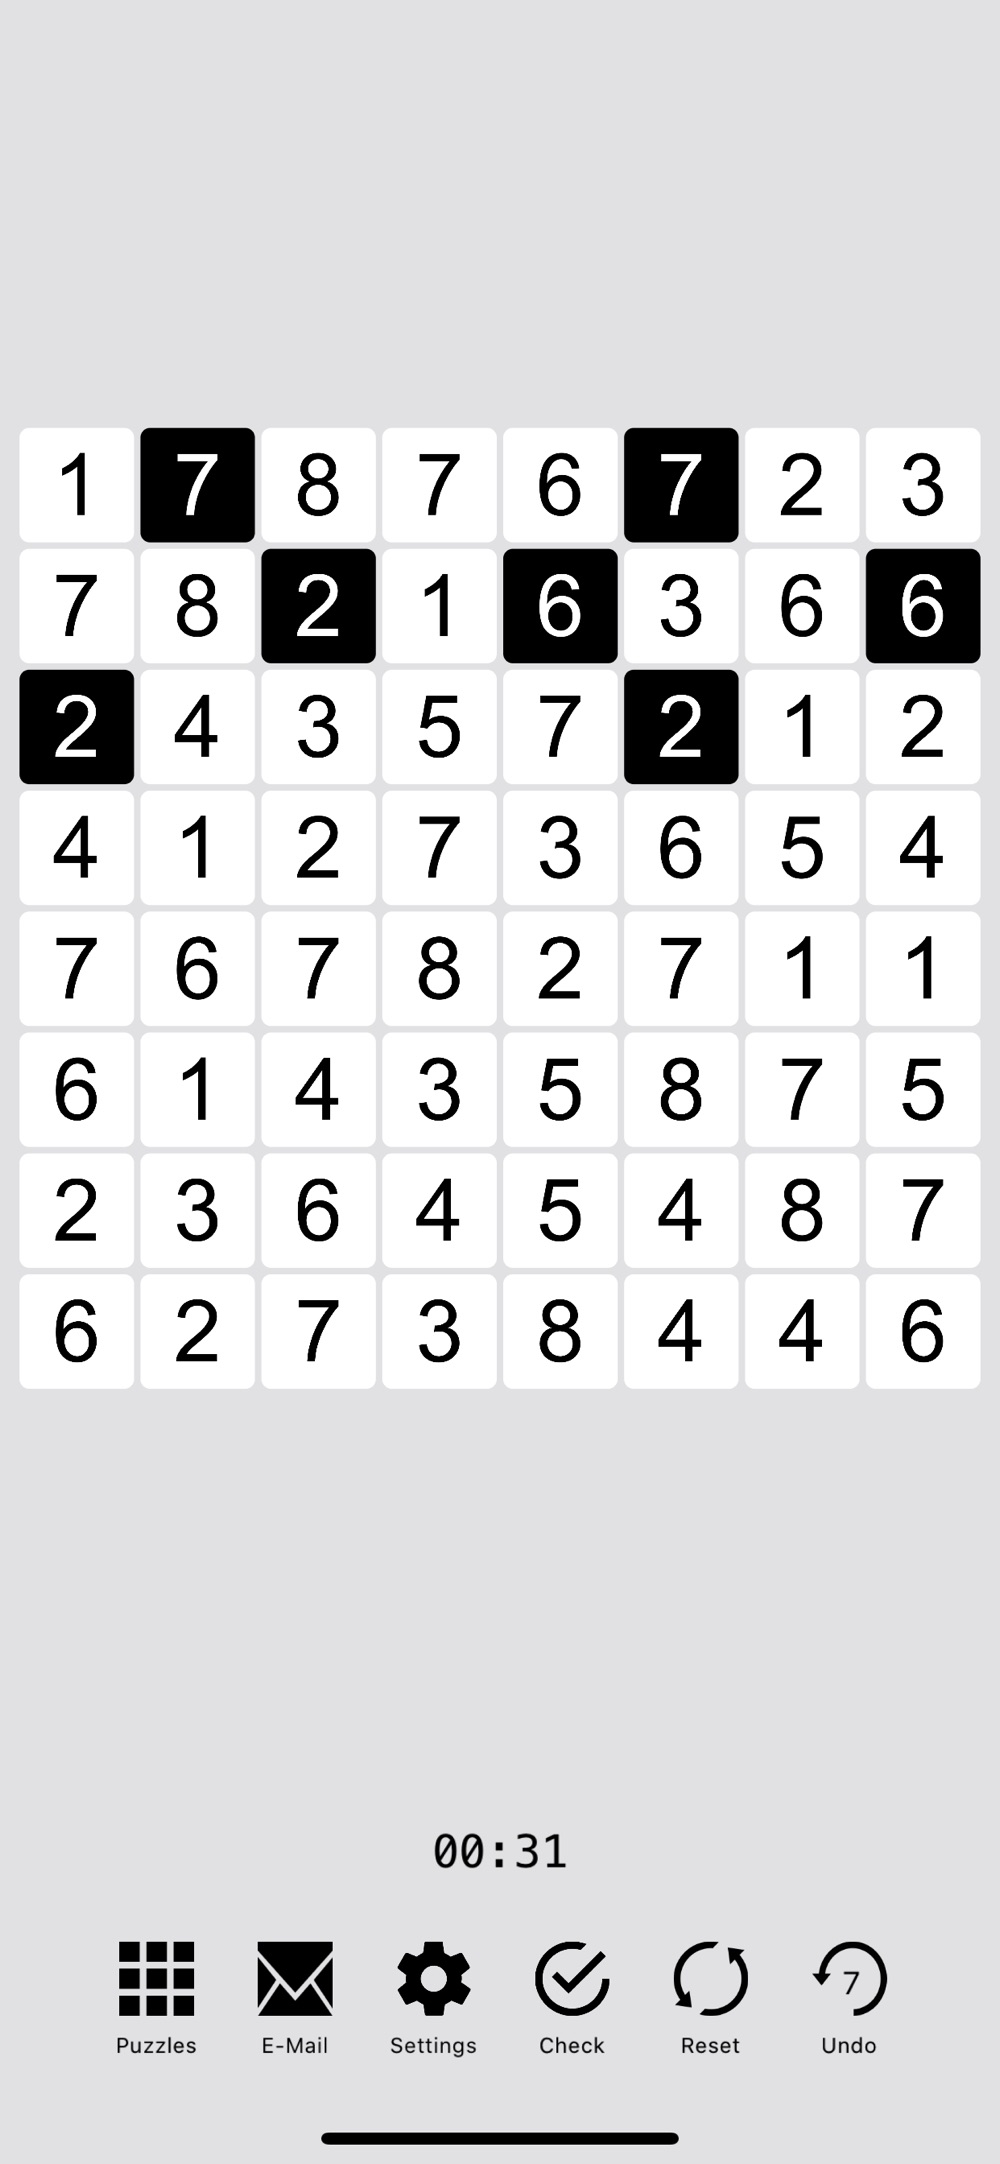 Hitori – Logic Puzzles Cheat Codes